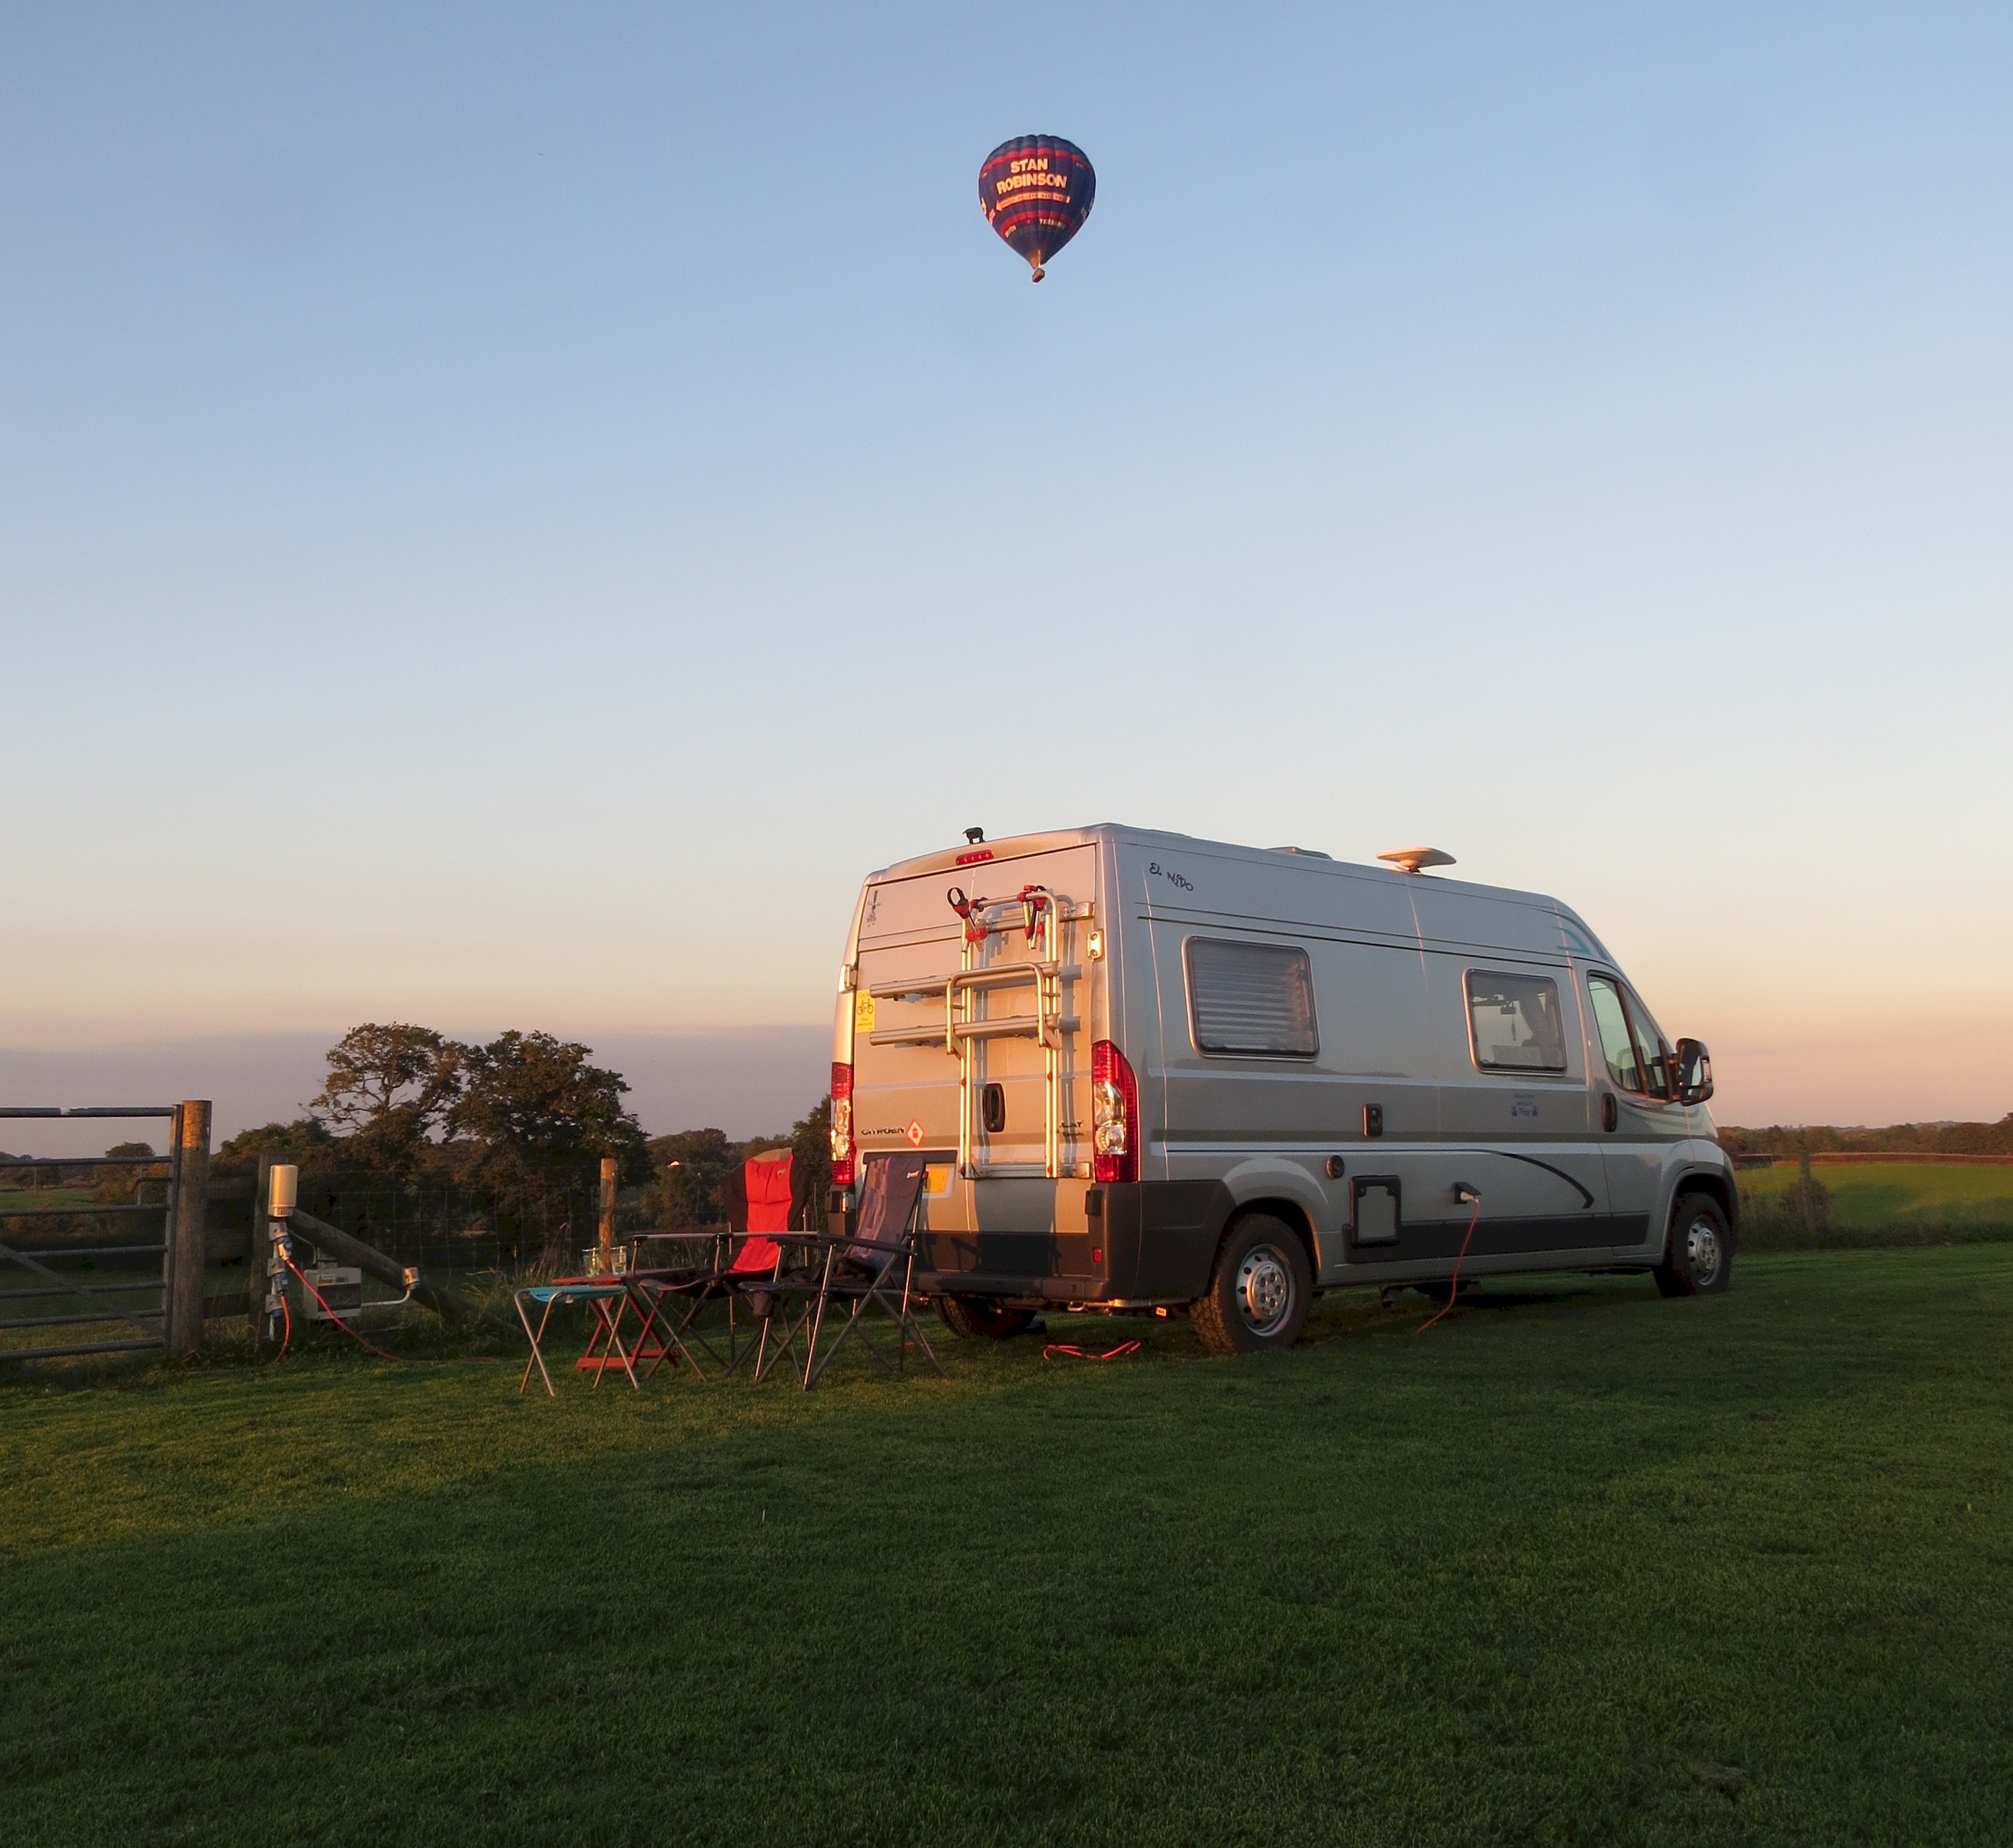 Hot air balloon over motorhome